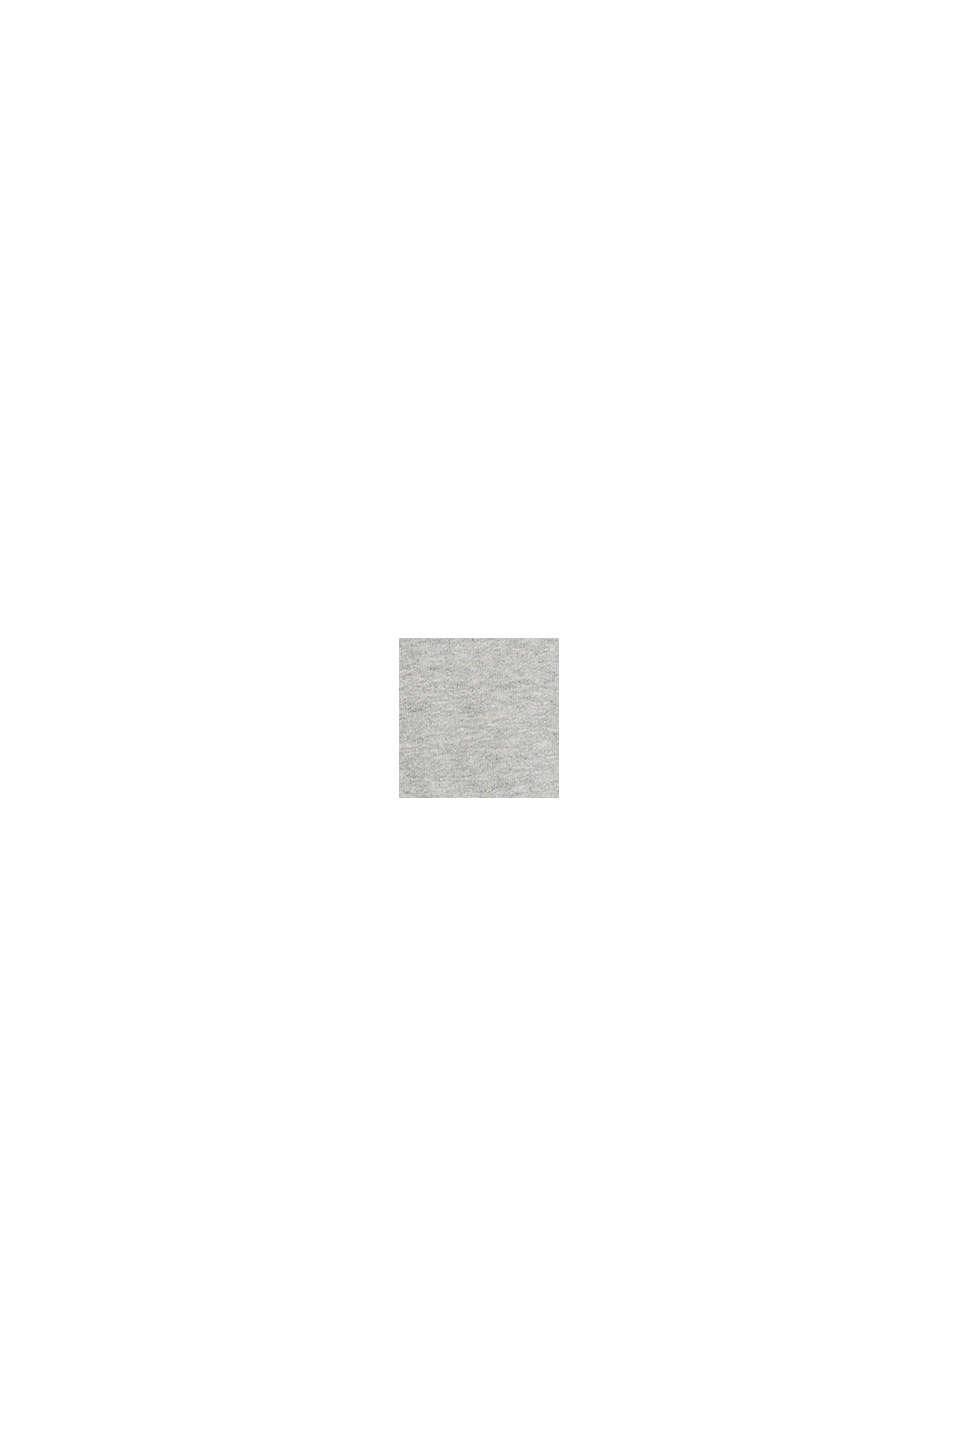 Hoodie-Kleid mit Print, 100% Baumwolle, MEDIUM GREY, swatch